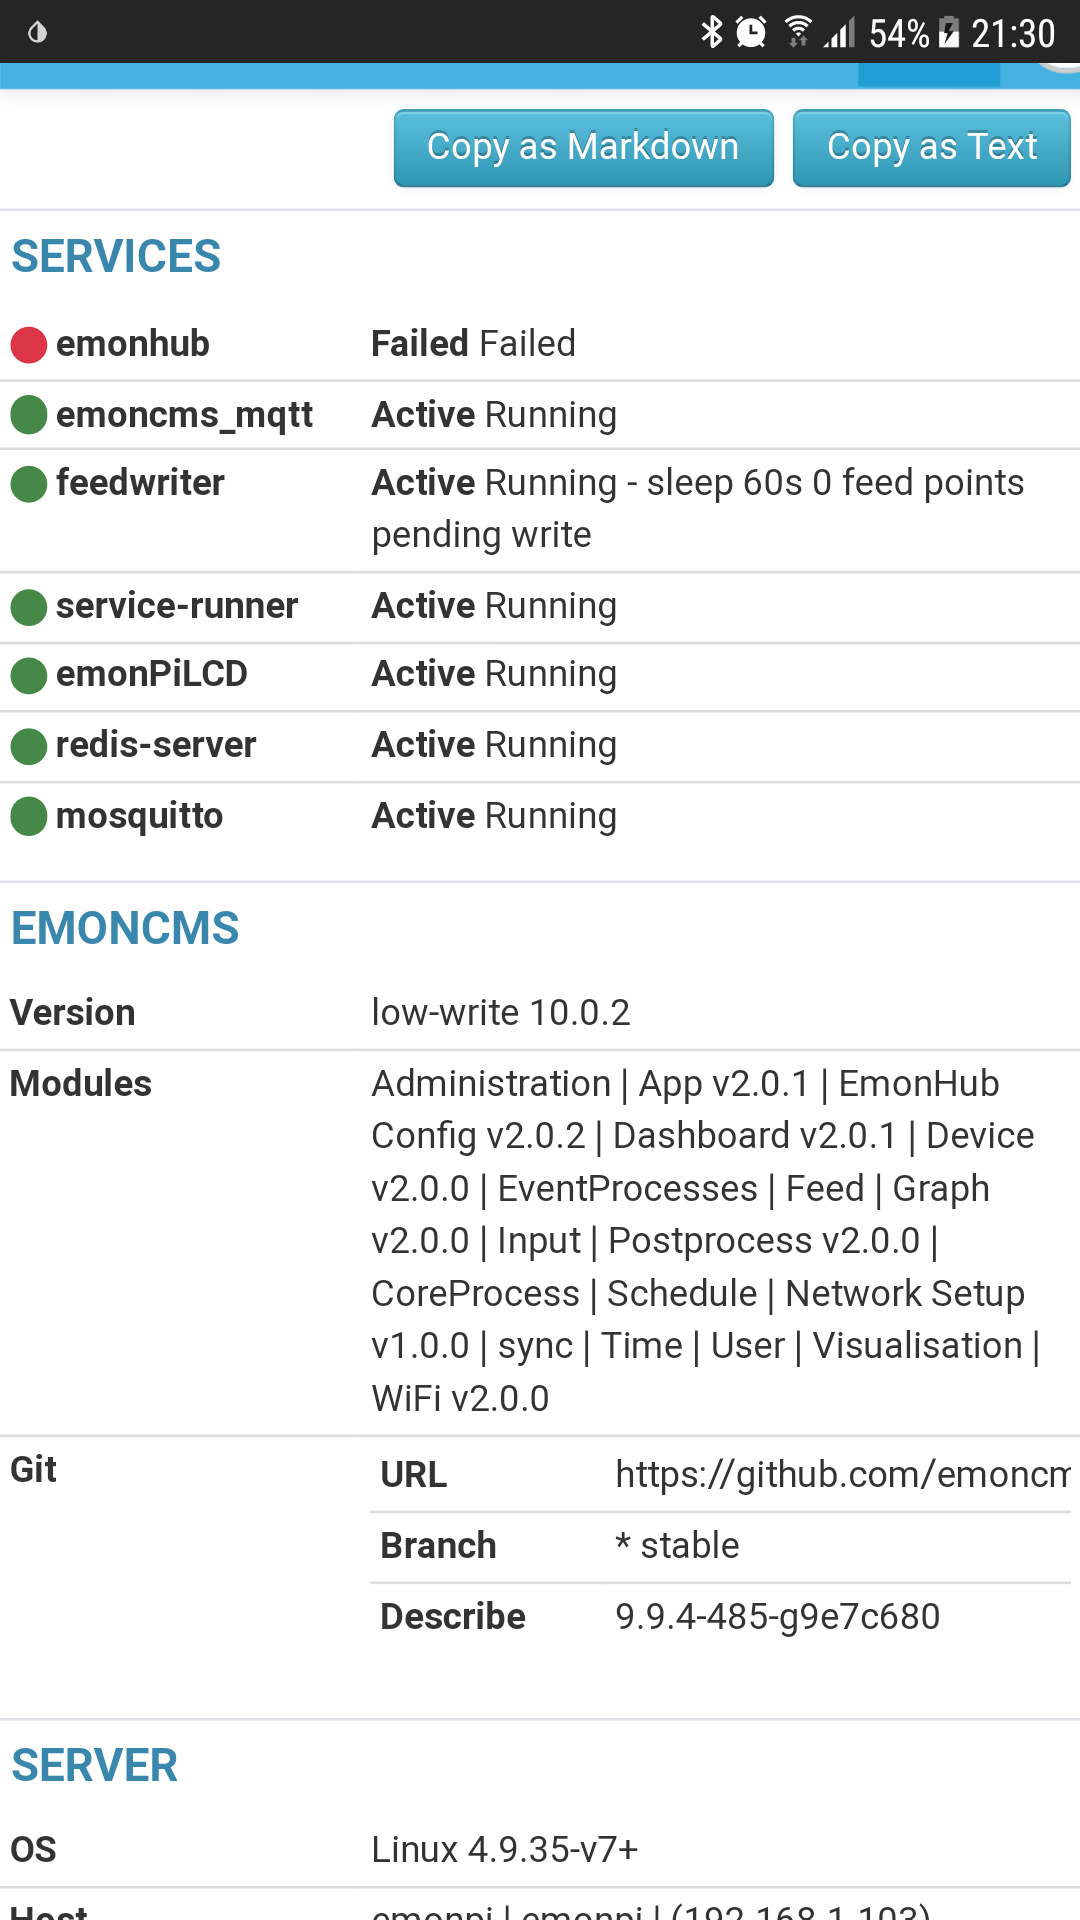 Emoncms V10 0 0-beta master branch release - Emoncms - Community